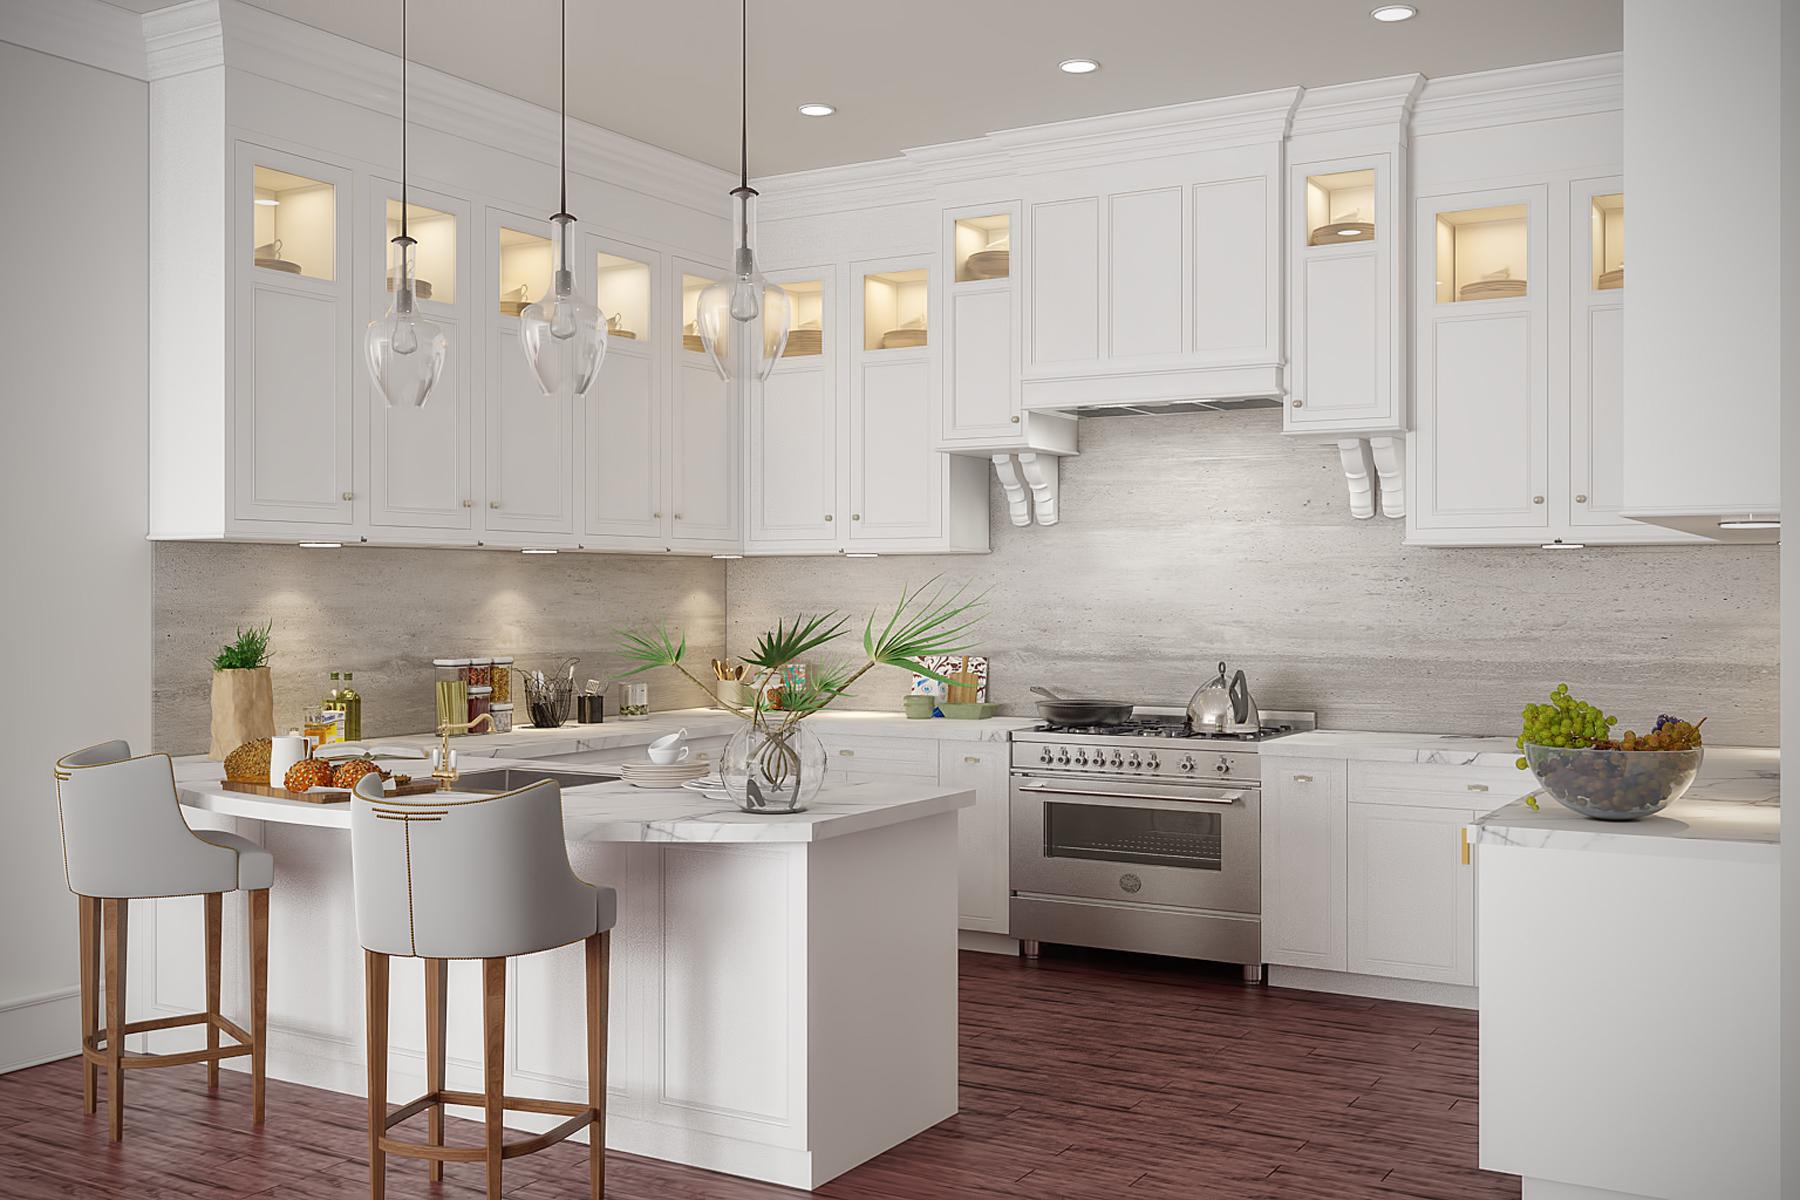 Condominiums للـ Sale في The Heritage at Claremont 80 Claremont Road, Residence 107, Bernardsville, New Jersey 07924 United States